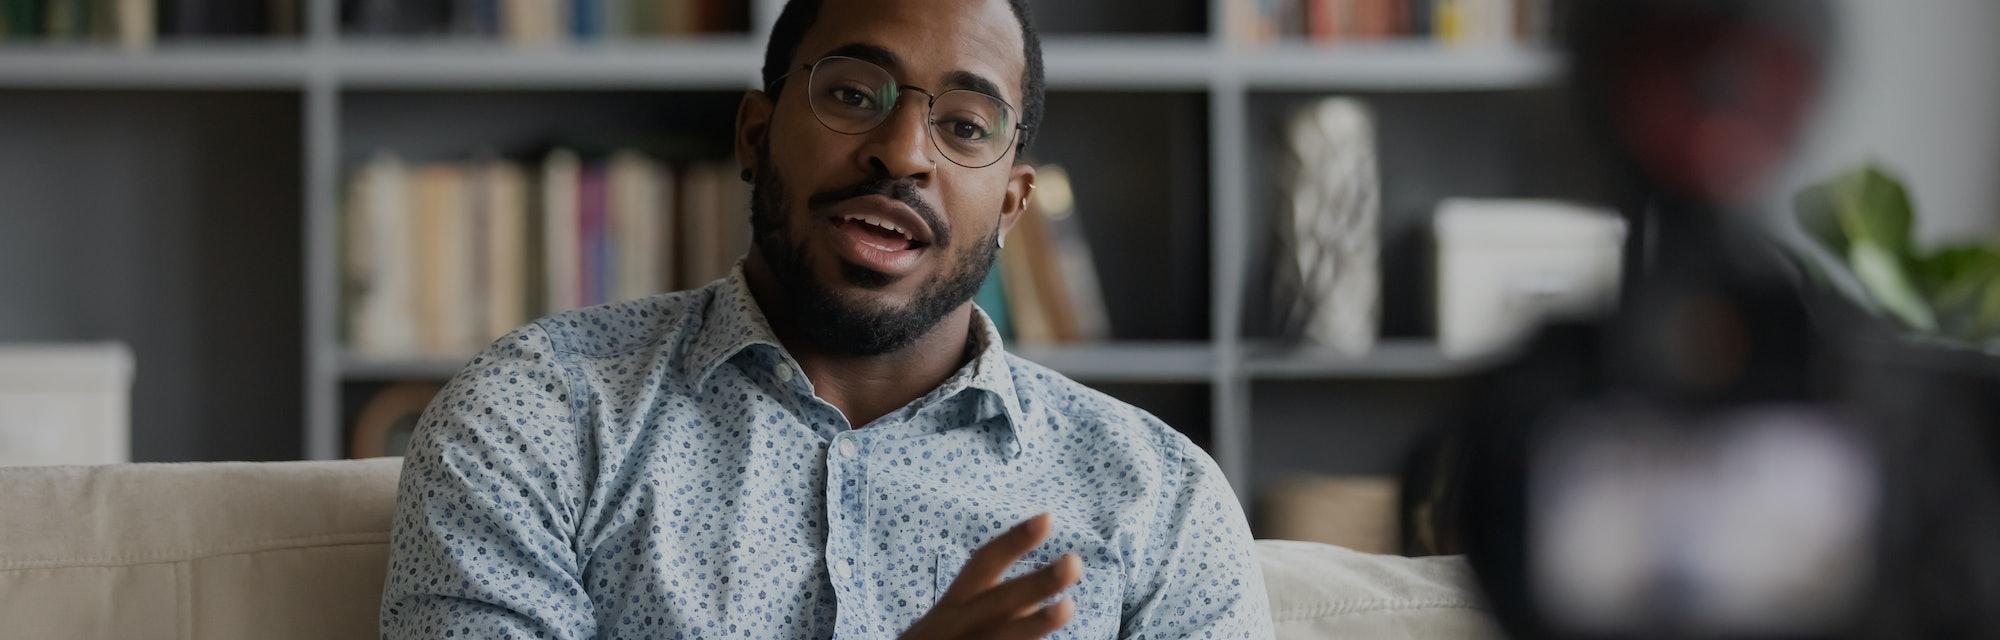 Millennial african hipster man blogger recording vlog on digital camera sit on sofa in living room, ...